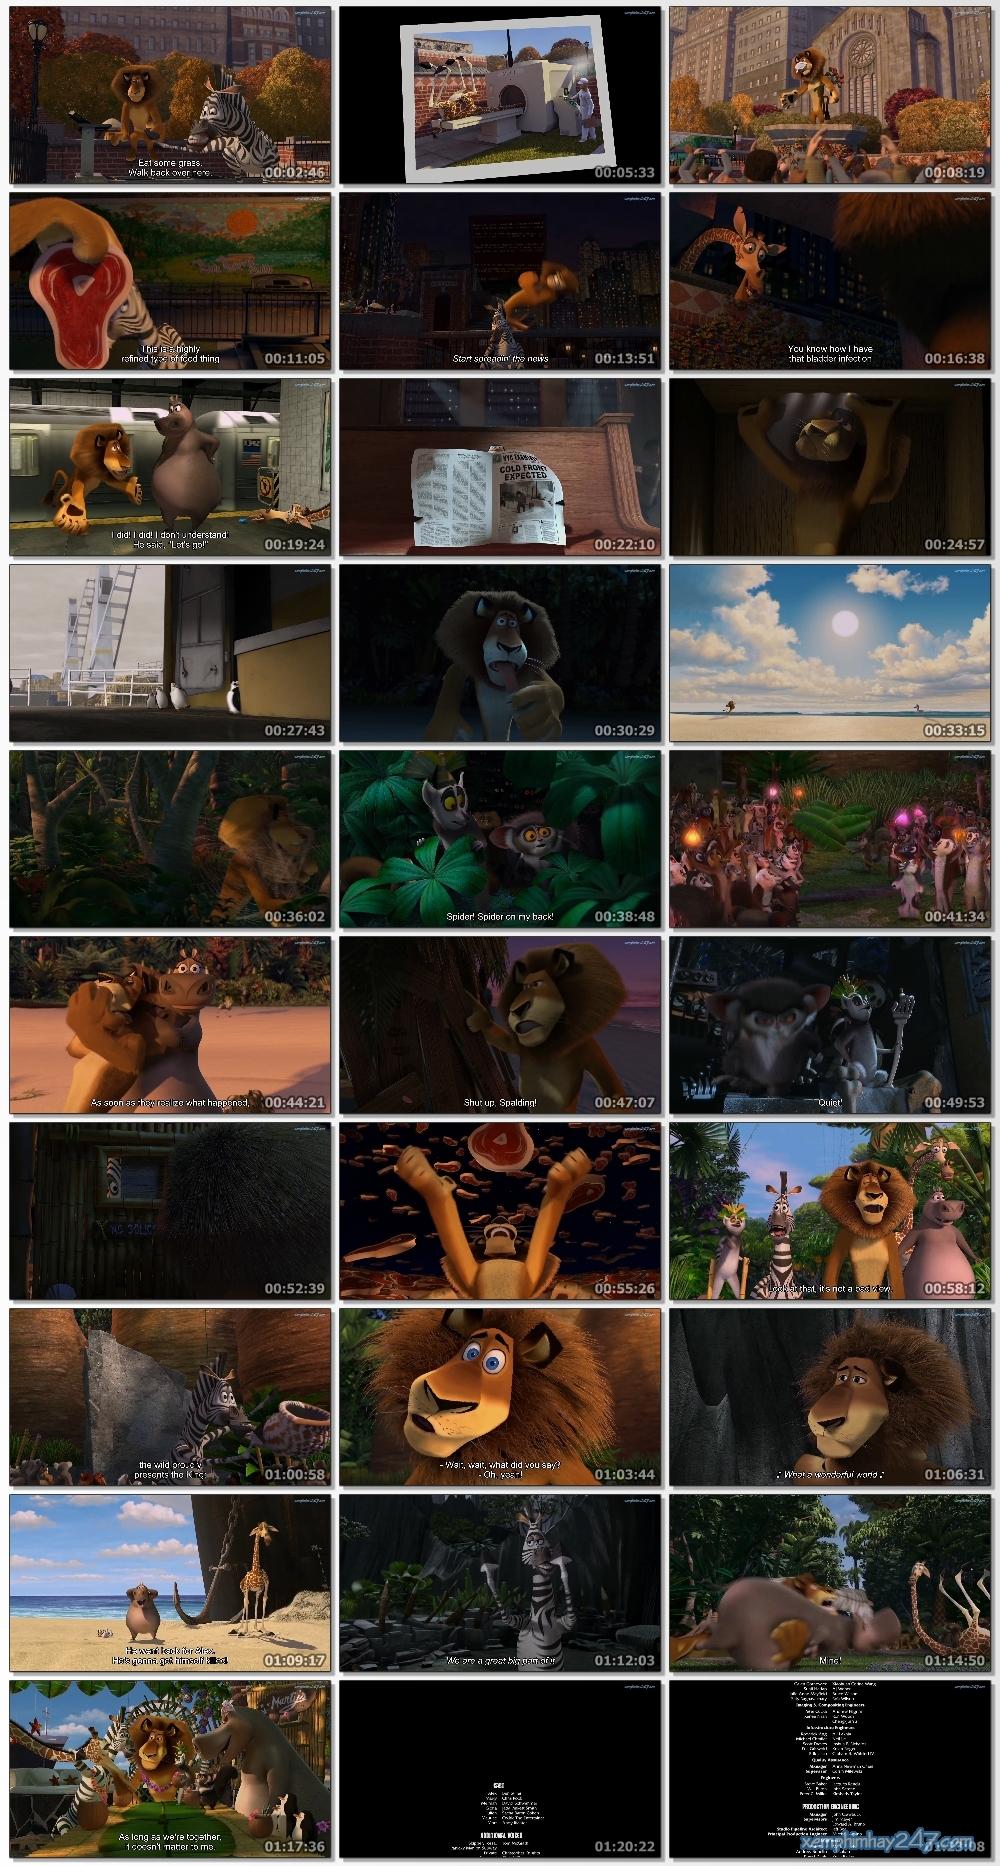 http://xemphimhay247.com - Xem phim hay 247 - Madagascar 1: Cuộc Phiêu Lưu Đến Madagascar (2005) - Madagascar (2005)